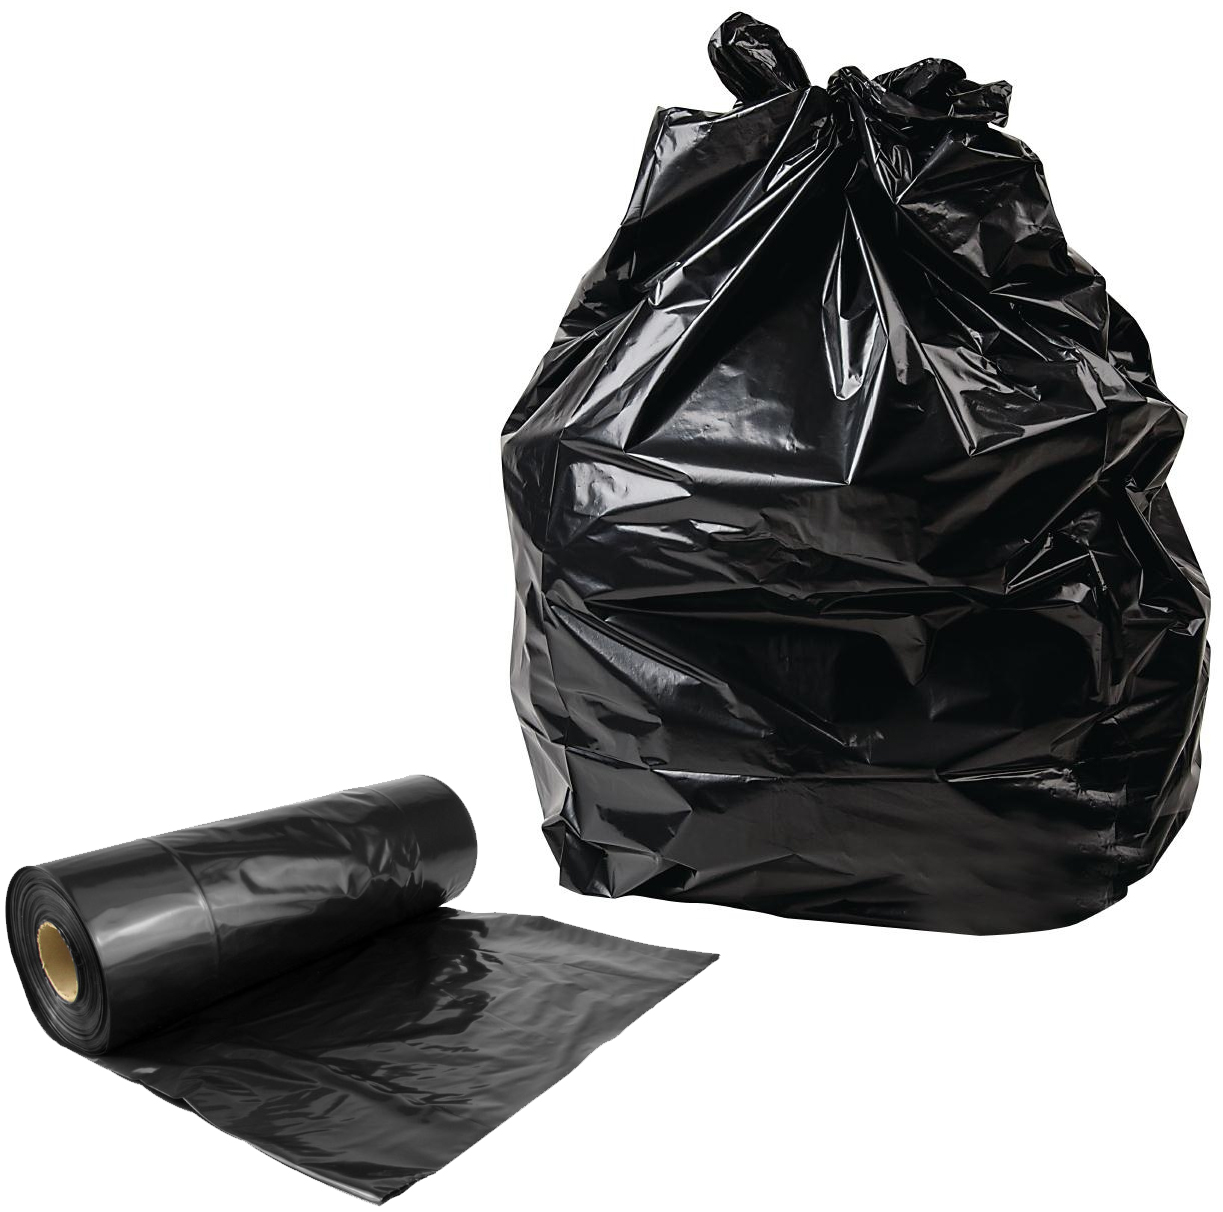 Strong black bin bags decorative l brackets